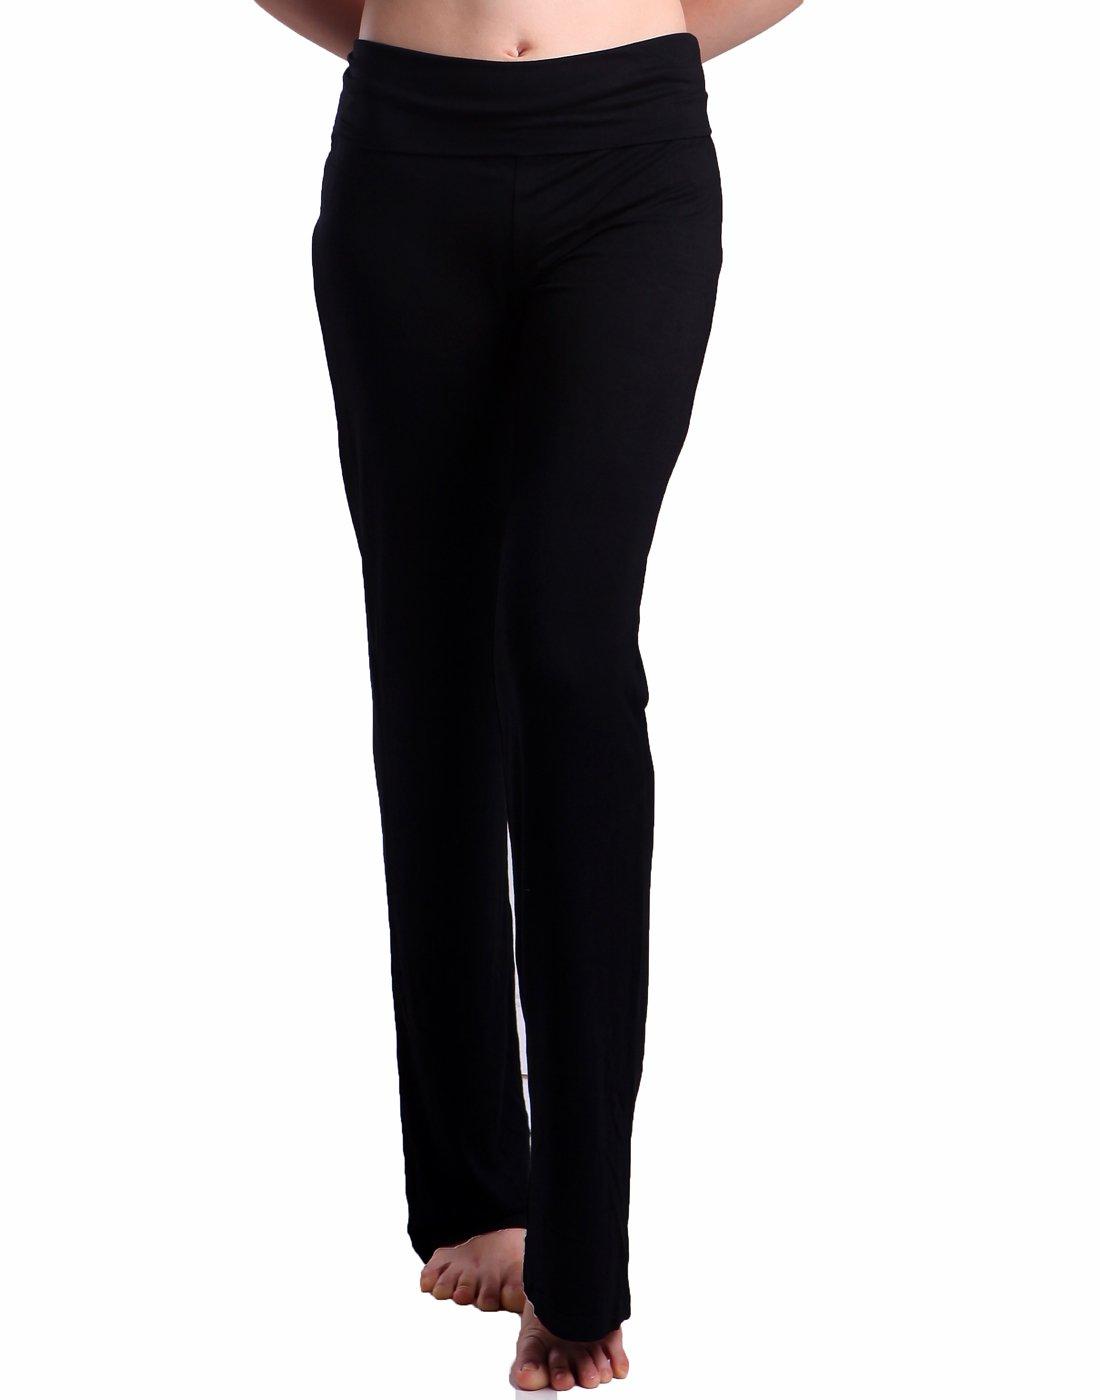 HDE Foldover Athletic Yoga Pants Gym Workout Leggings (Black, X-Large)